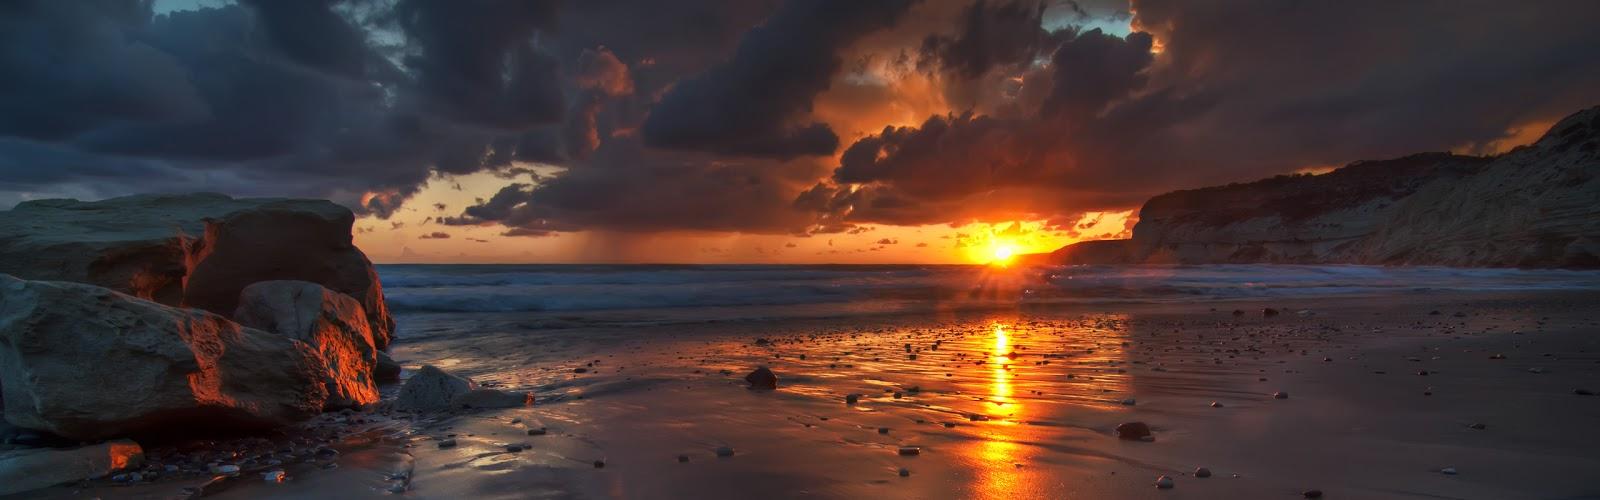 Hi Def Beach Sunset